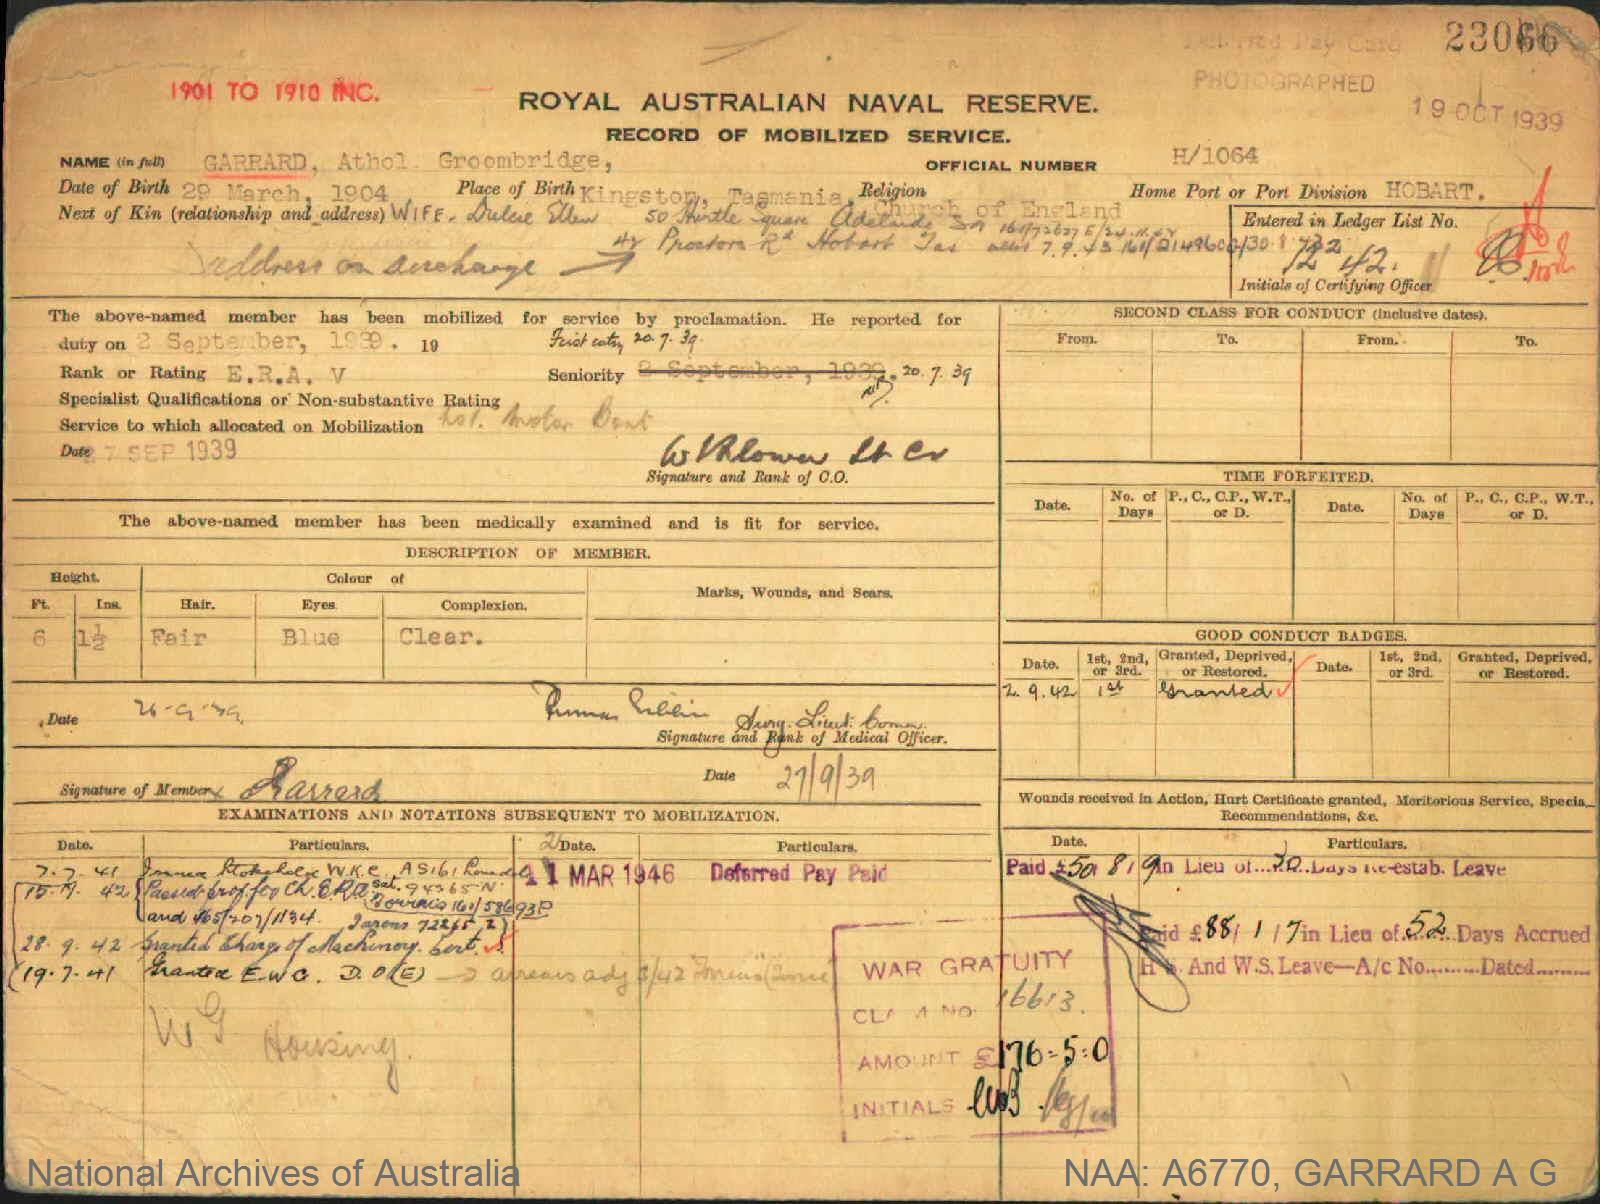 GARRARD ATHOL GROOMBRIDGE : Service Number - H/1064 : Date of birth - 29 Mar 1904 : Place of birth - KINGSTON TAS : Place of enlistment - HOBART TAS : Next of Kin - DULCIE